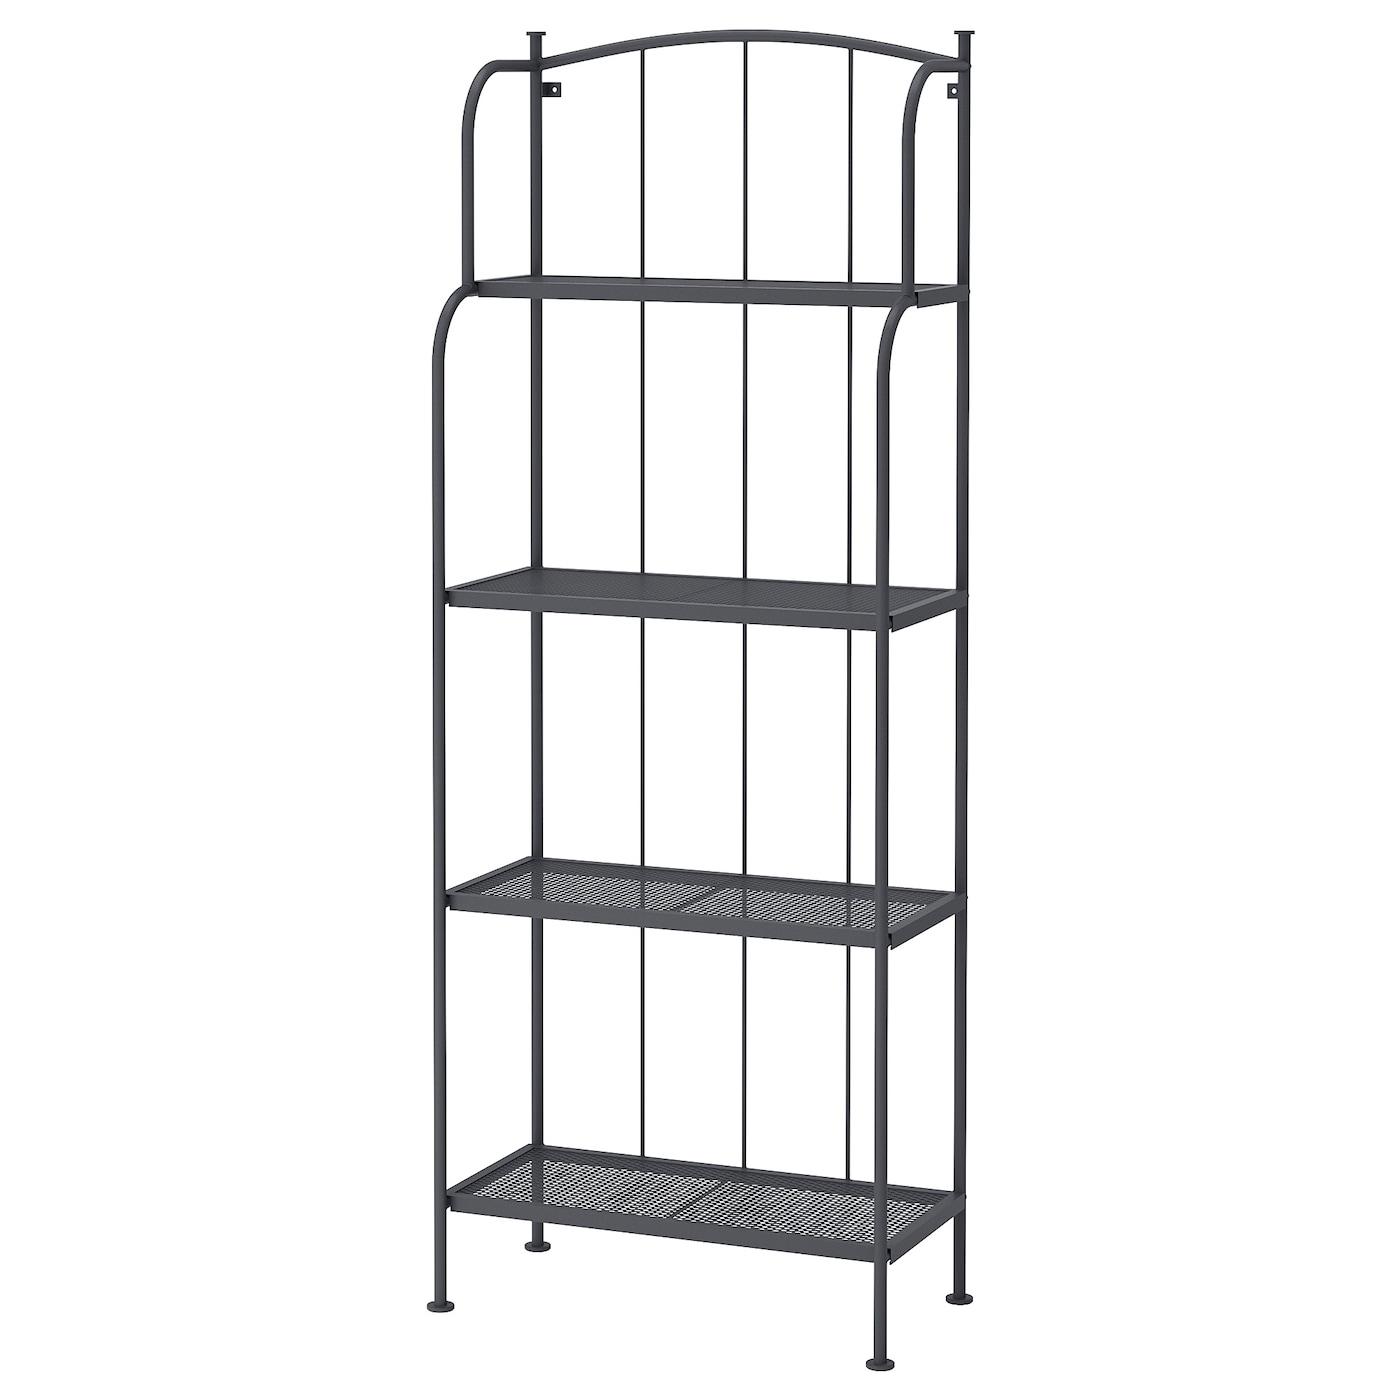 Lacko Regal Aussen Grau 61x160 Cm Ikea Deutschland